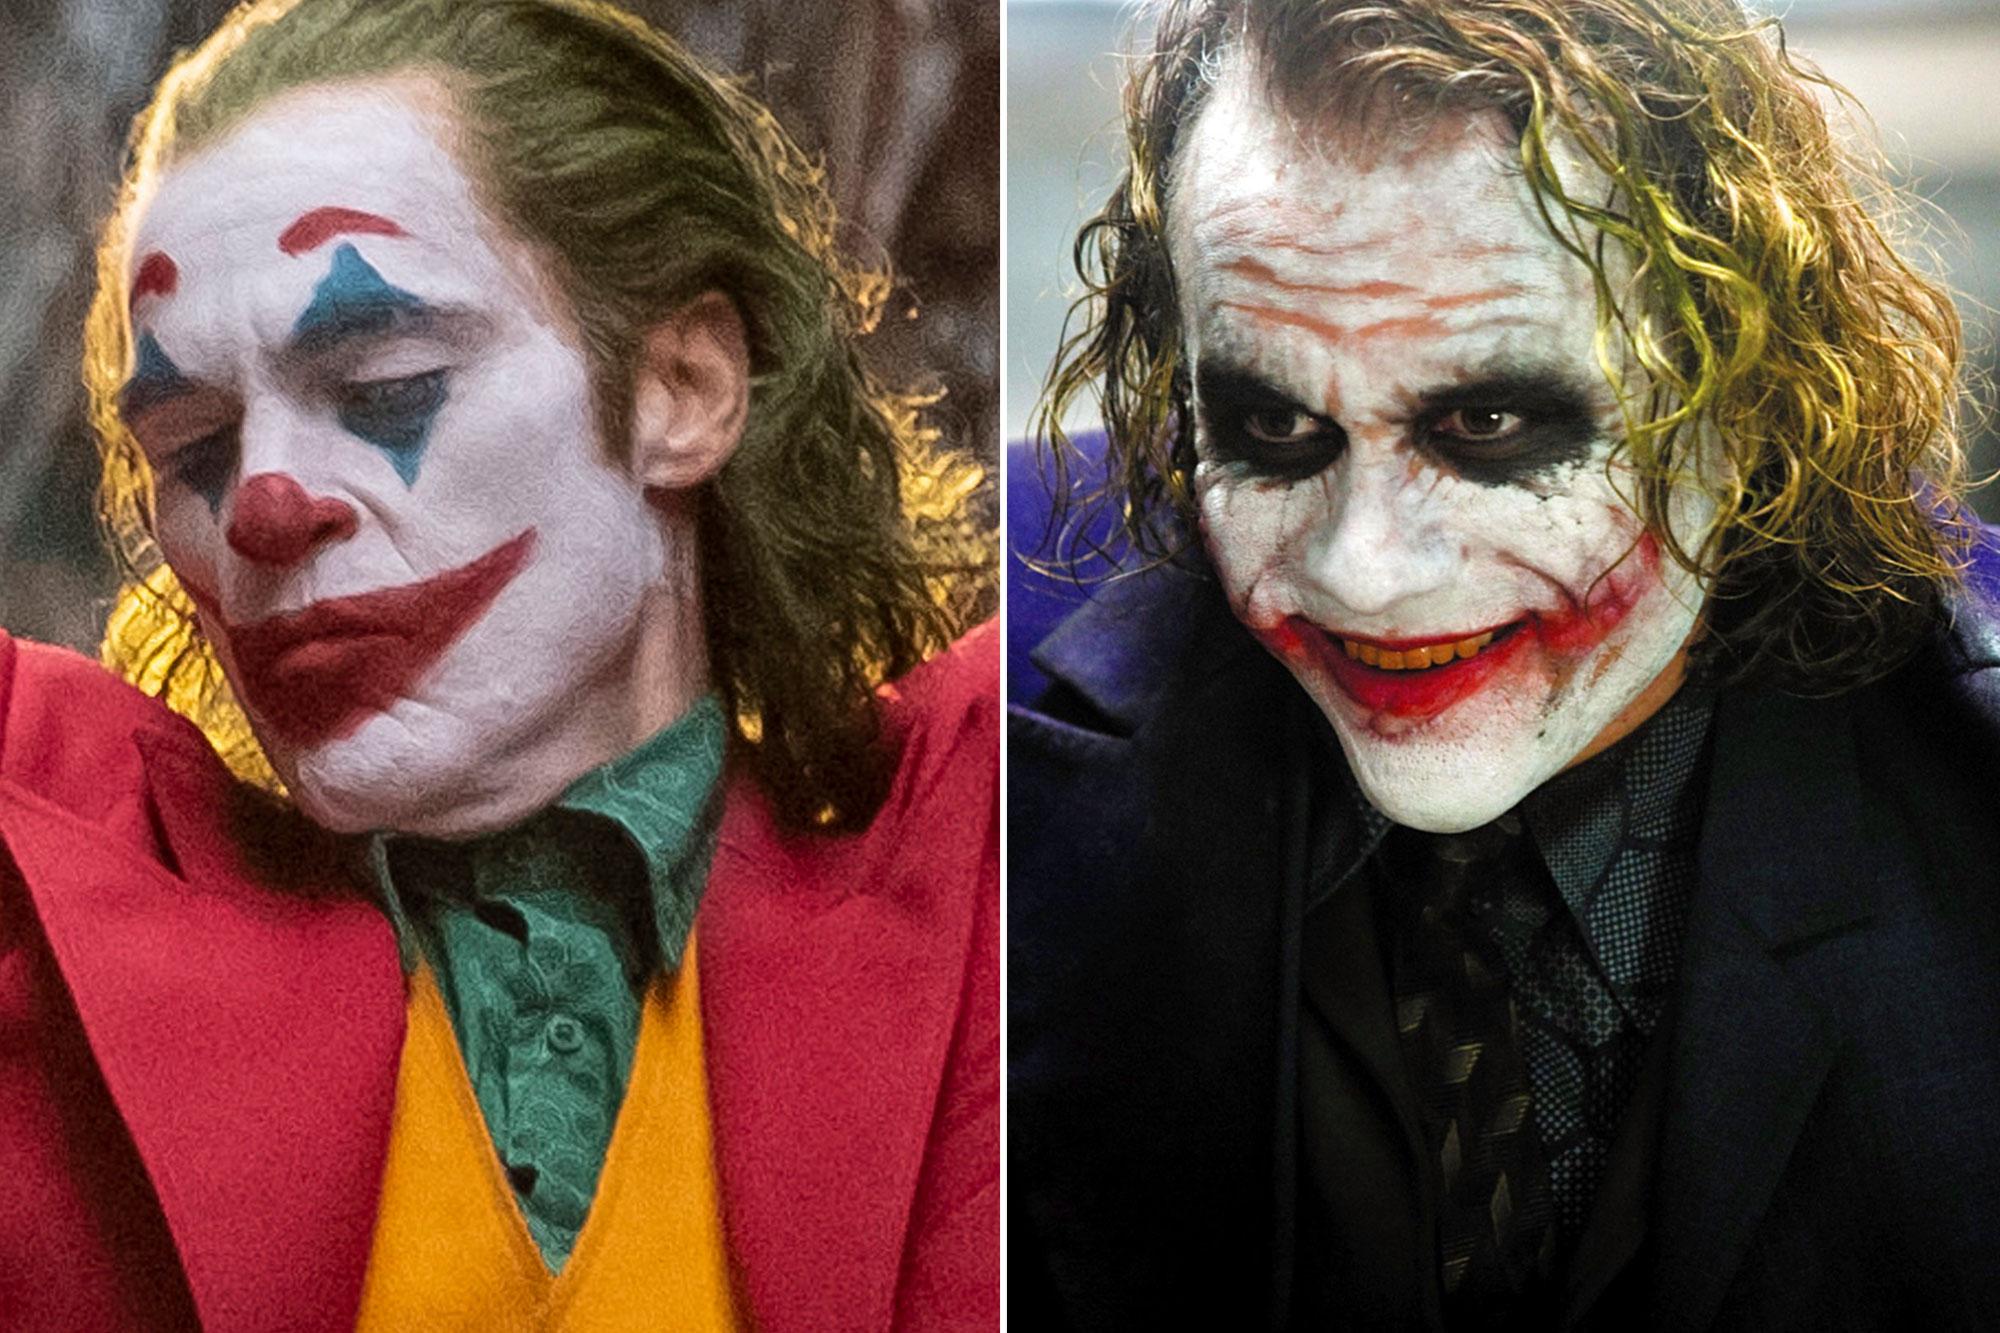 Heath Ledger Vs Joaquin Phoenix Poll: Joaquin Phoenix Says His Joker Version Is The Better Than